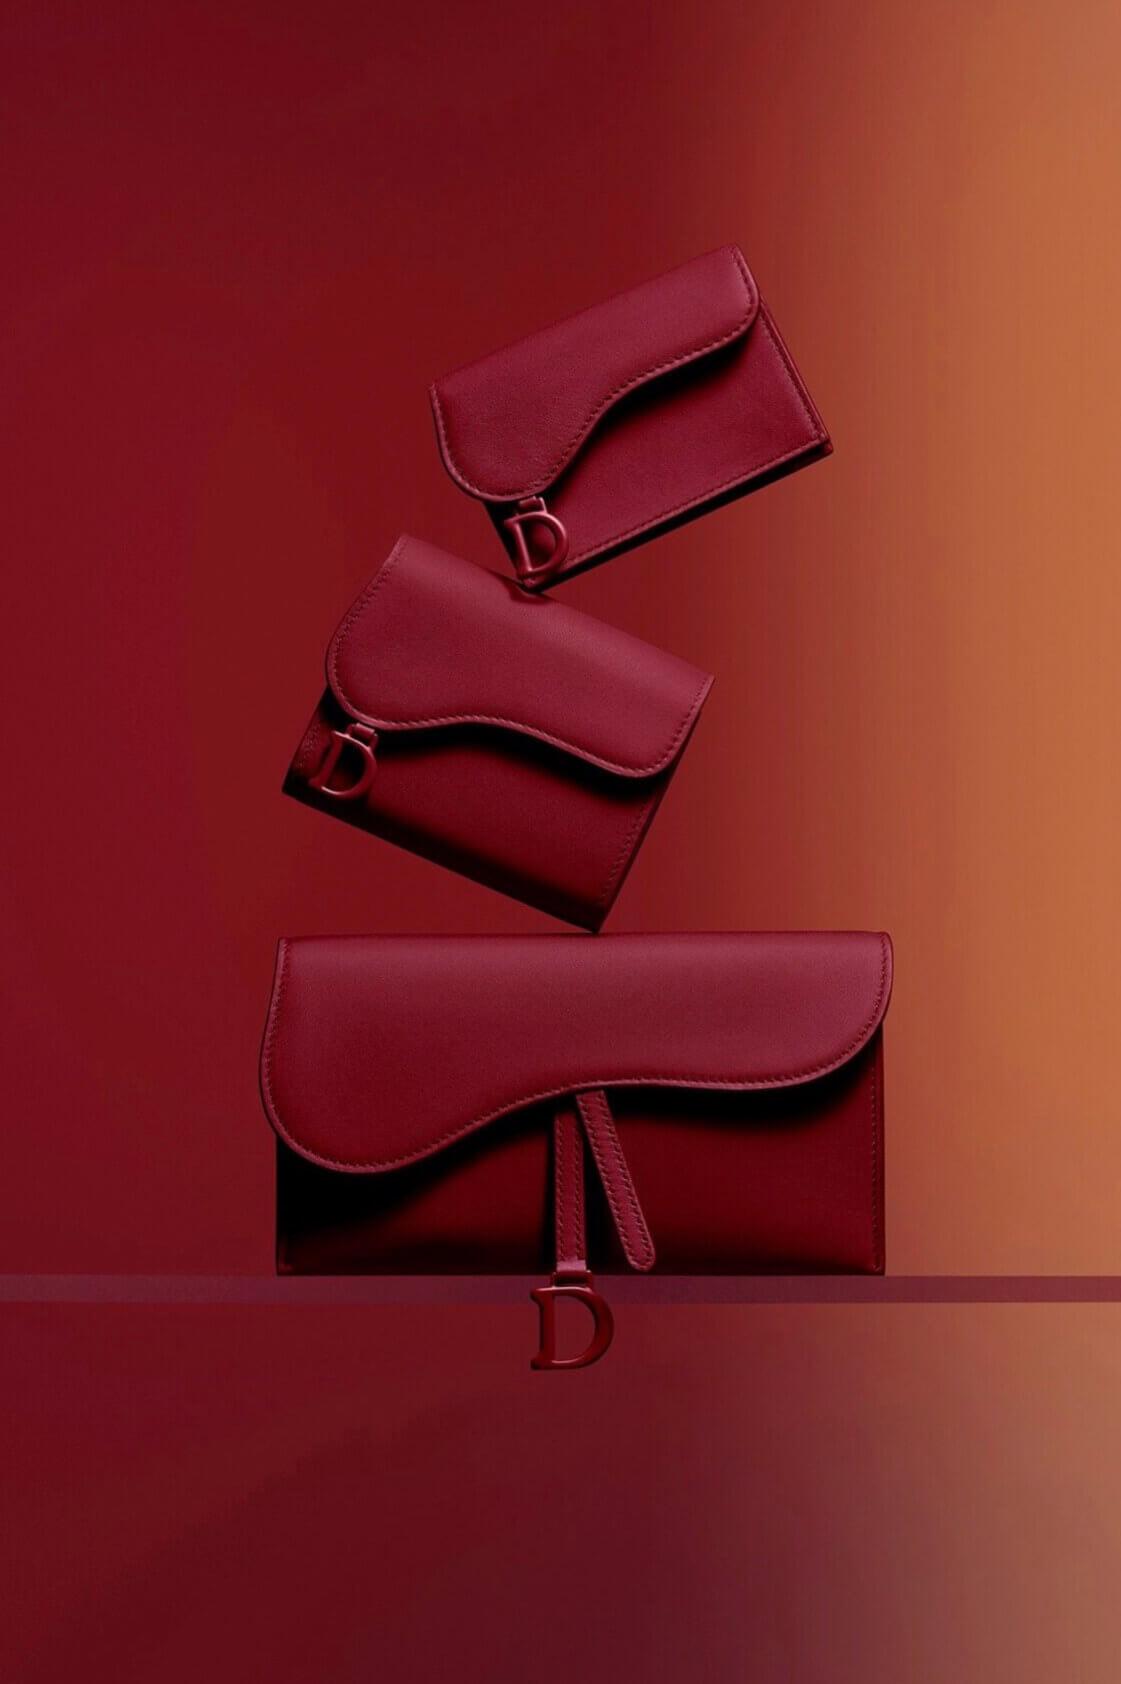 dior ultra matte kırmızı çanta